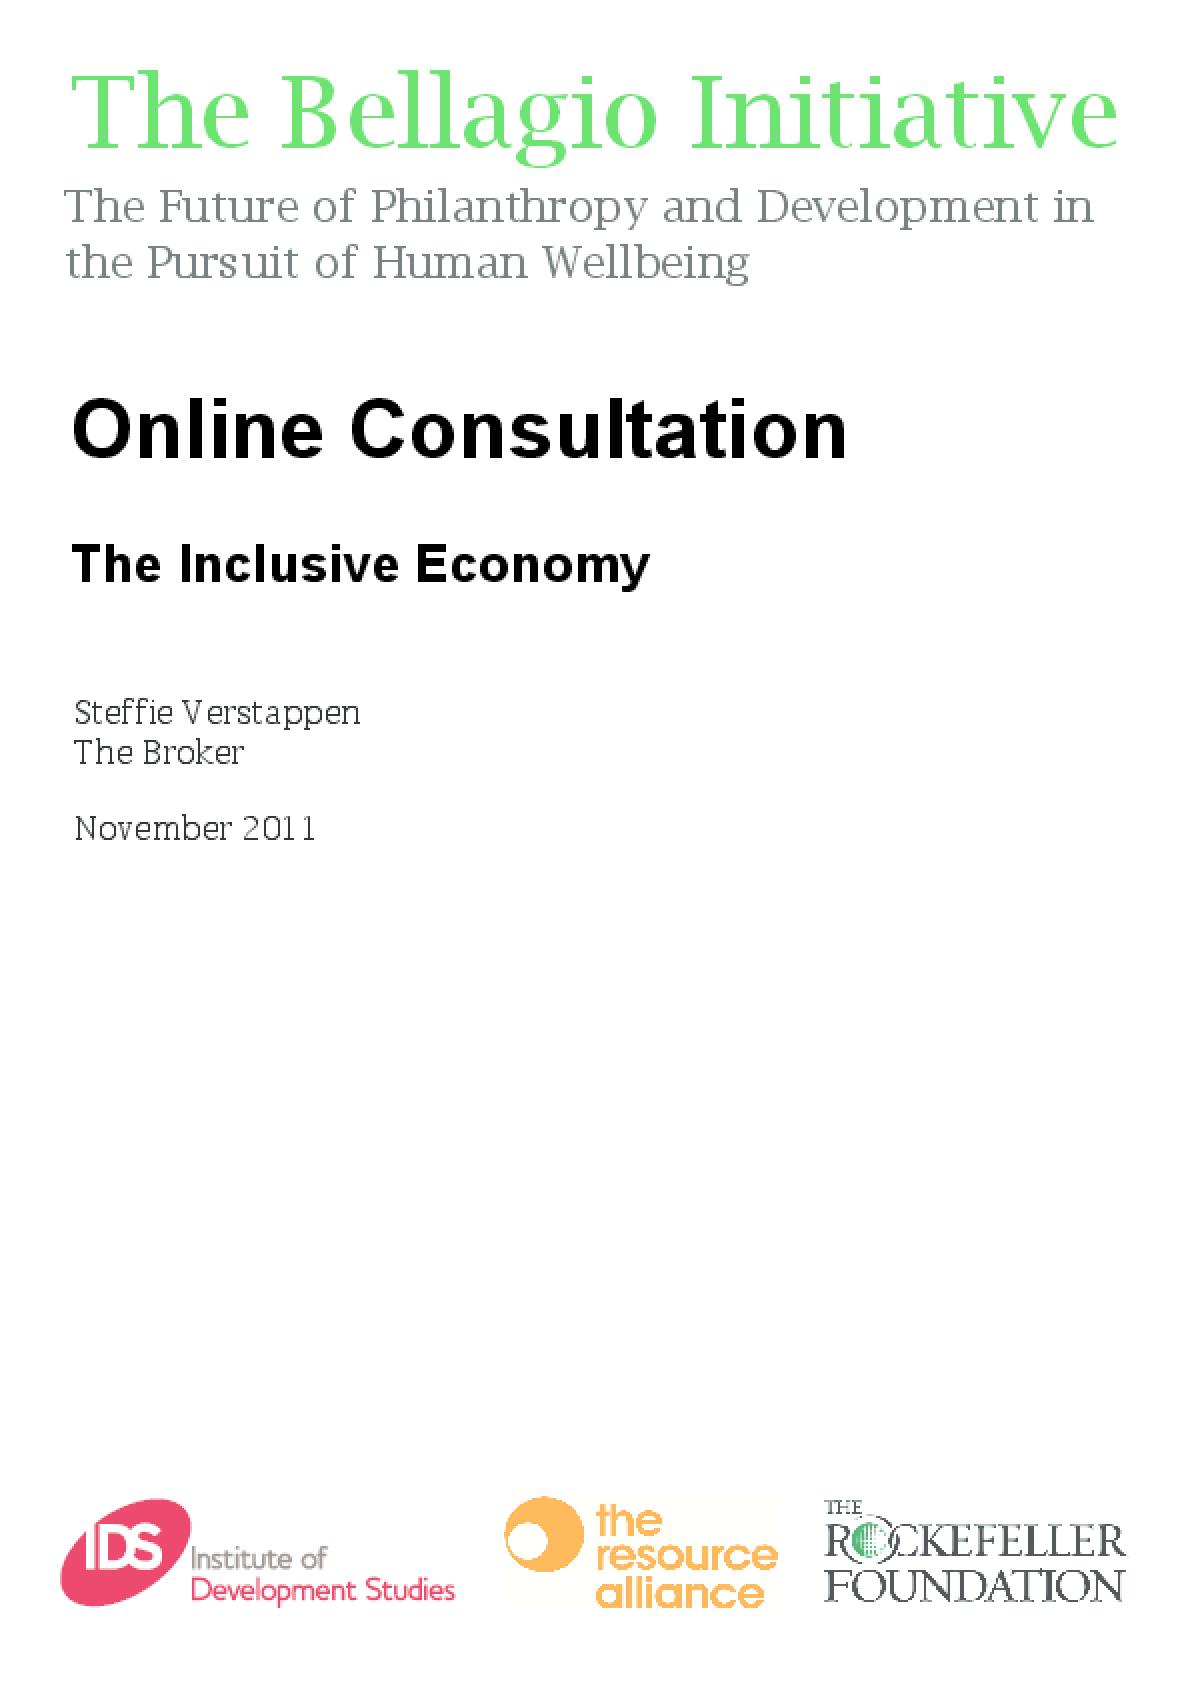 Online Consultation: The Inclusive Economy